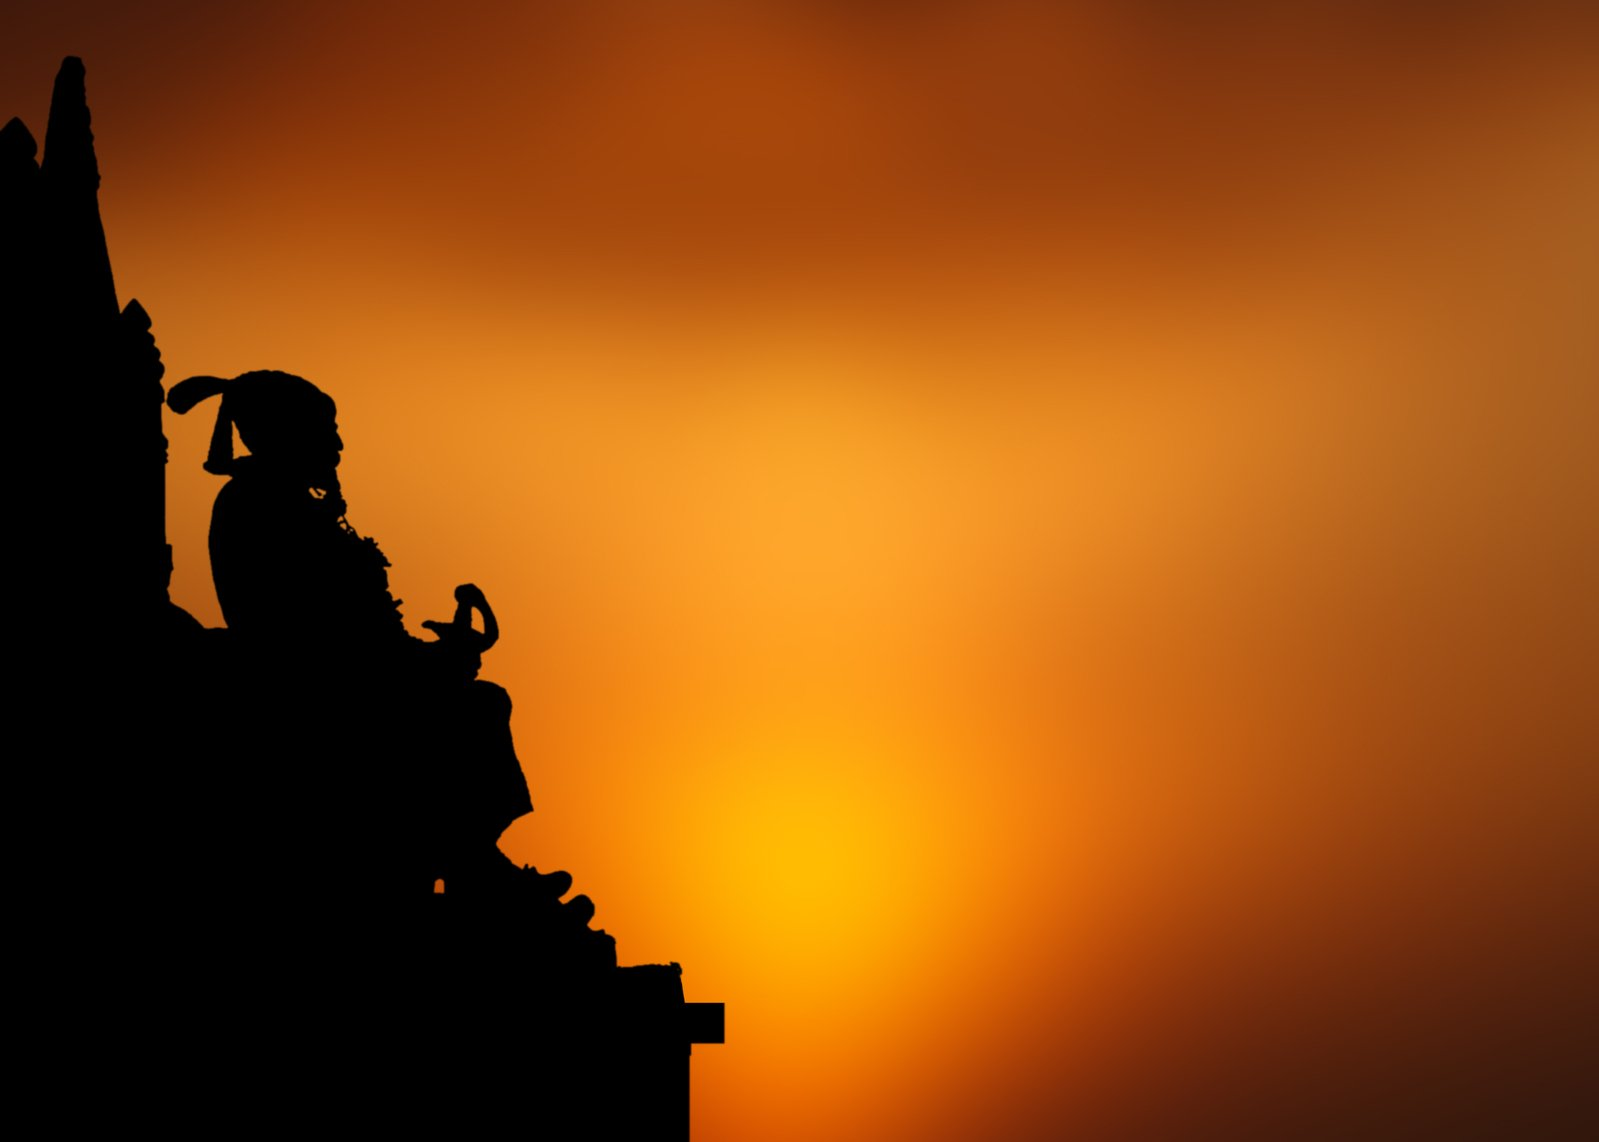 Chatrapati Shivaji Maharaj Hd Pic: Free Chatrapati Shivaji Maharaj Stock Photo